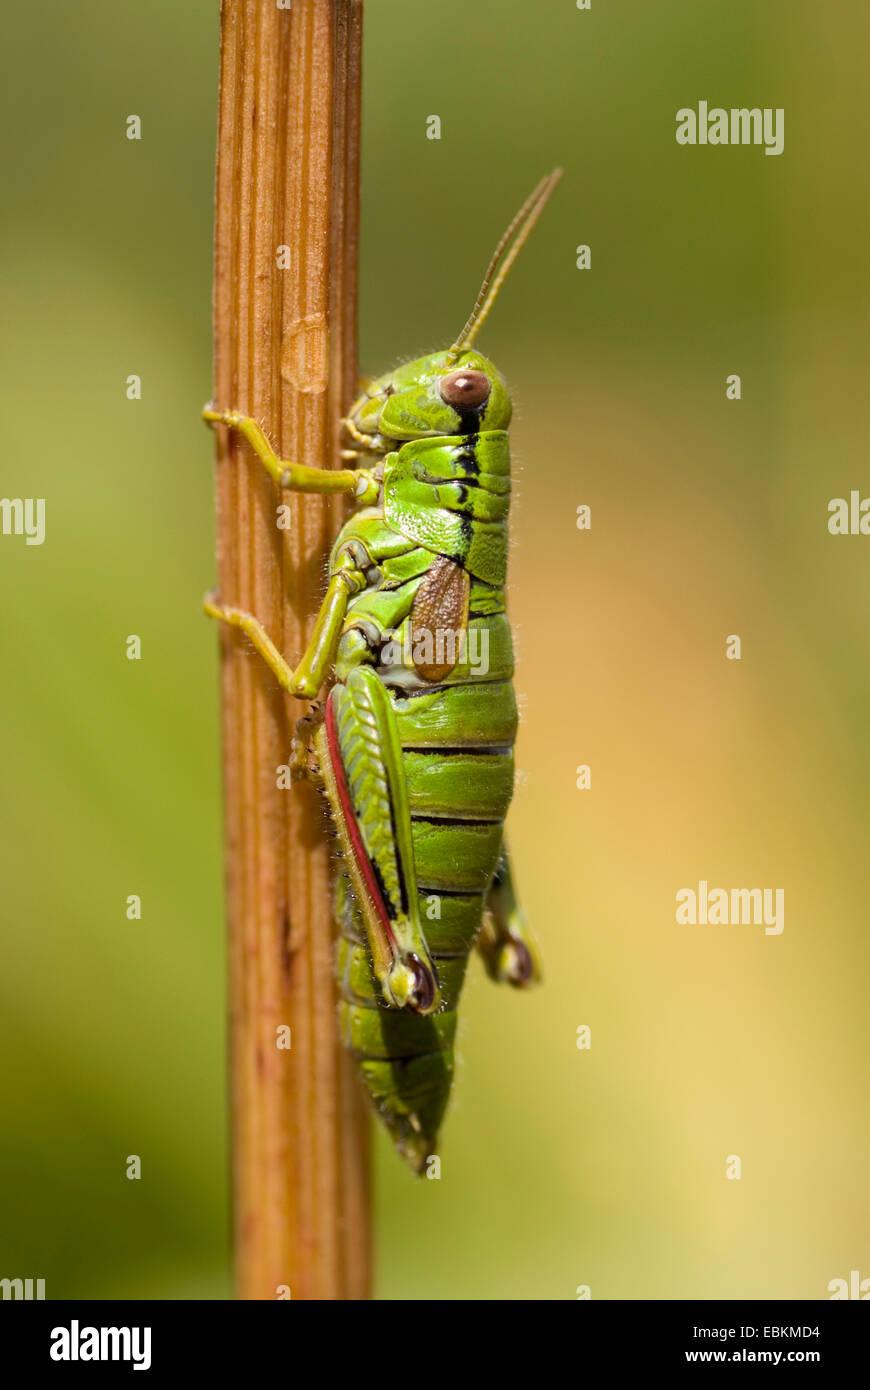 green mountain grasshopper,Alpine migratory grasshopper* (Miramella alpina), sitting at a sprout, Germany - Stock Image